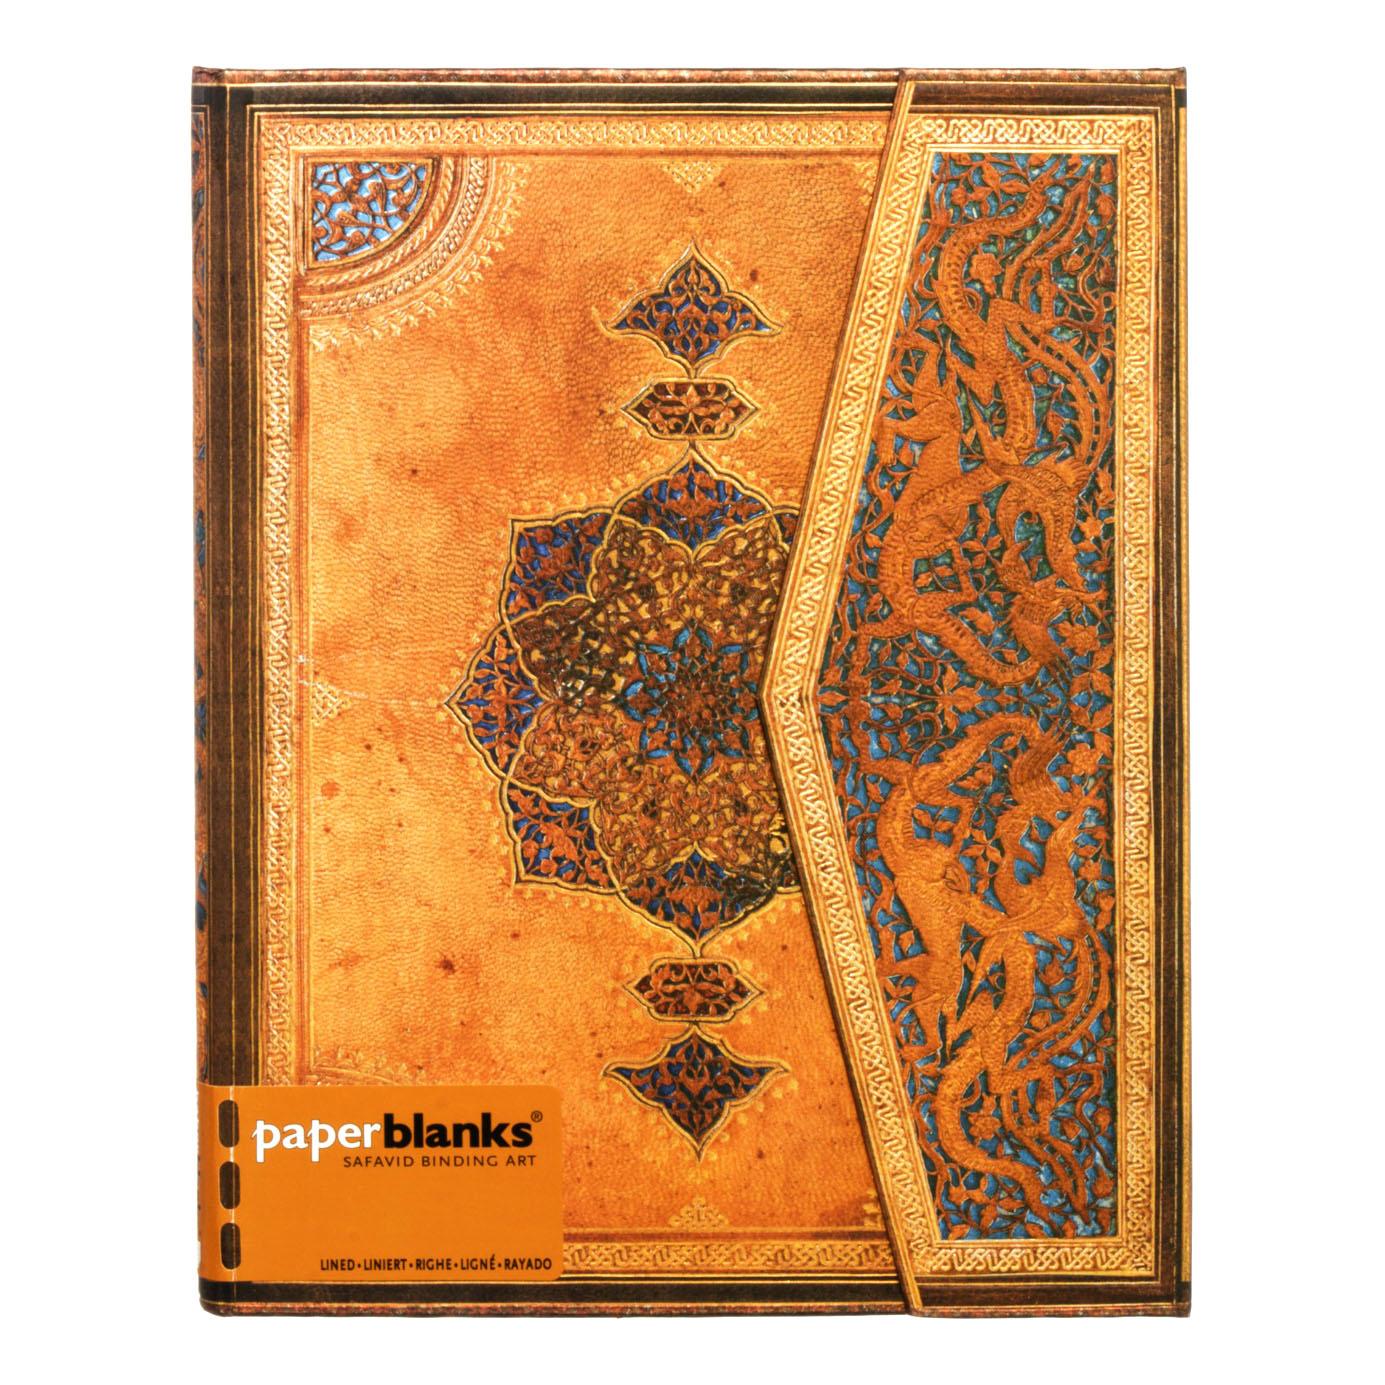 Paperblanks Safavid Binding Art Ultra Wrap Notebook 144